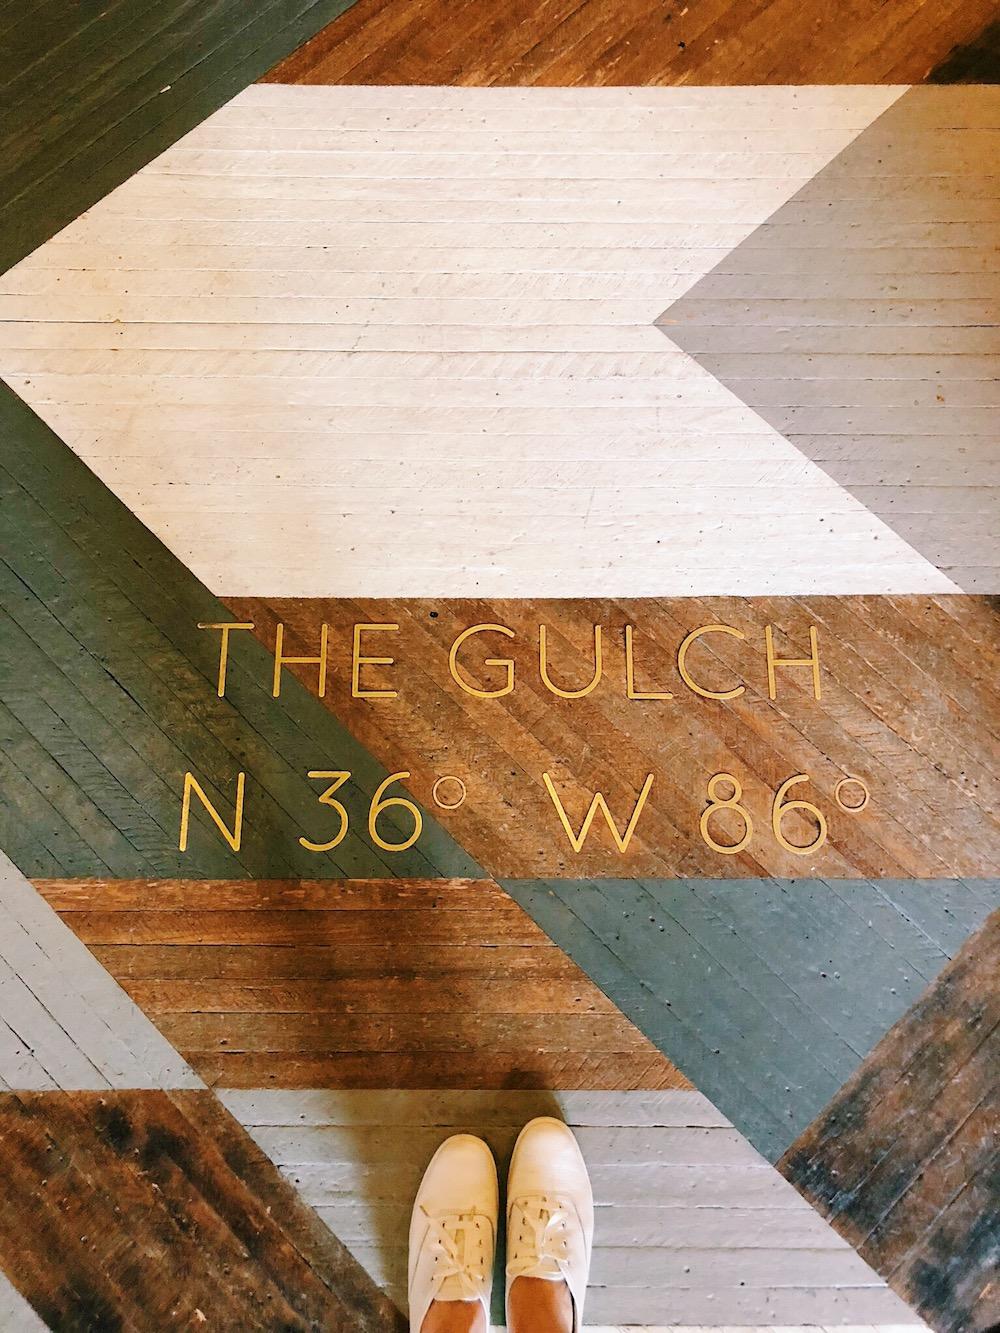 Art deco wood floor with location